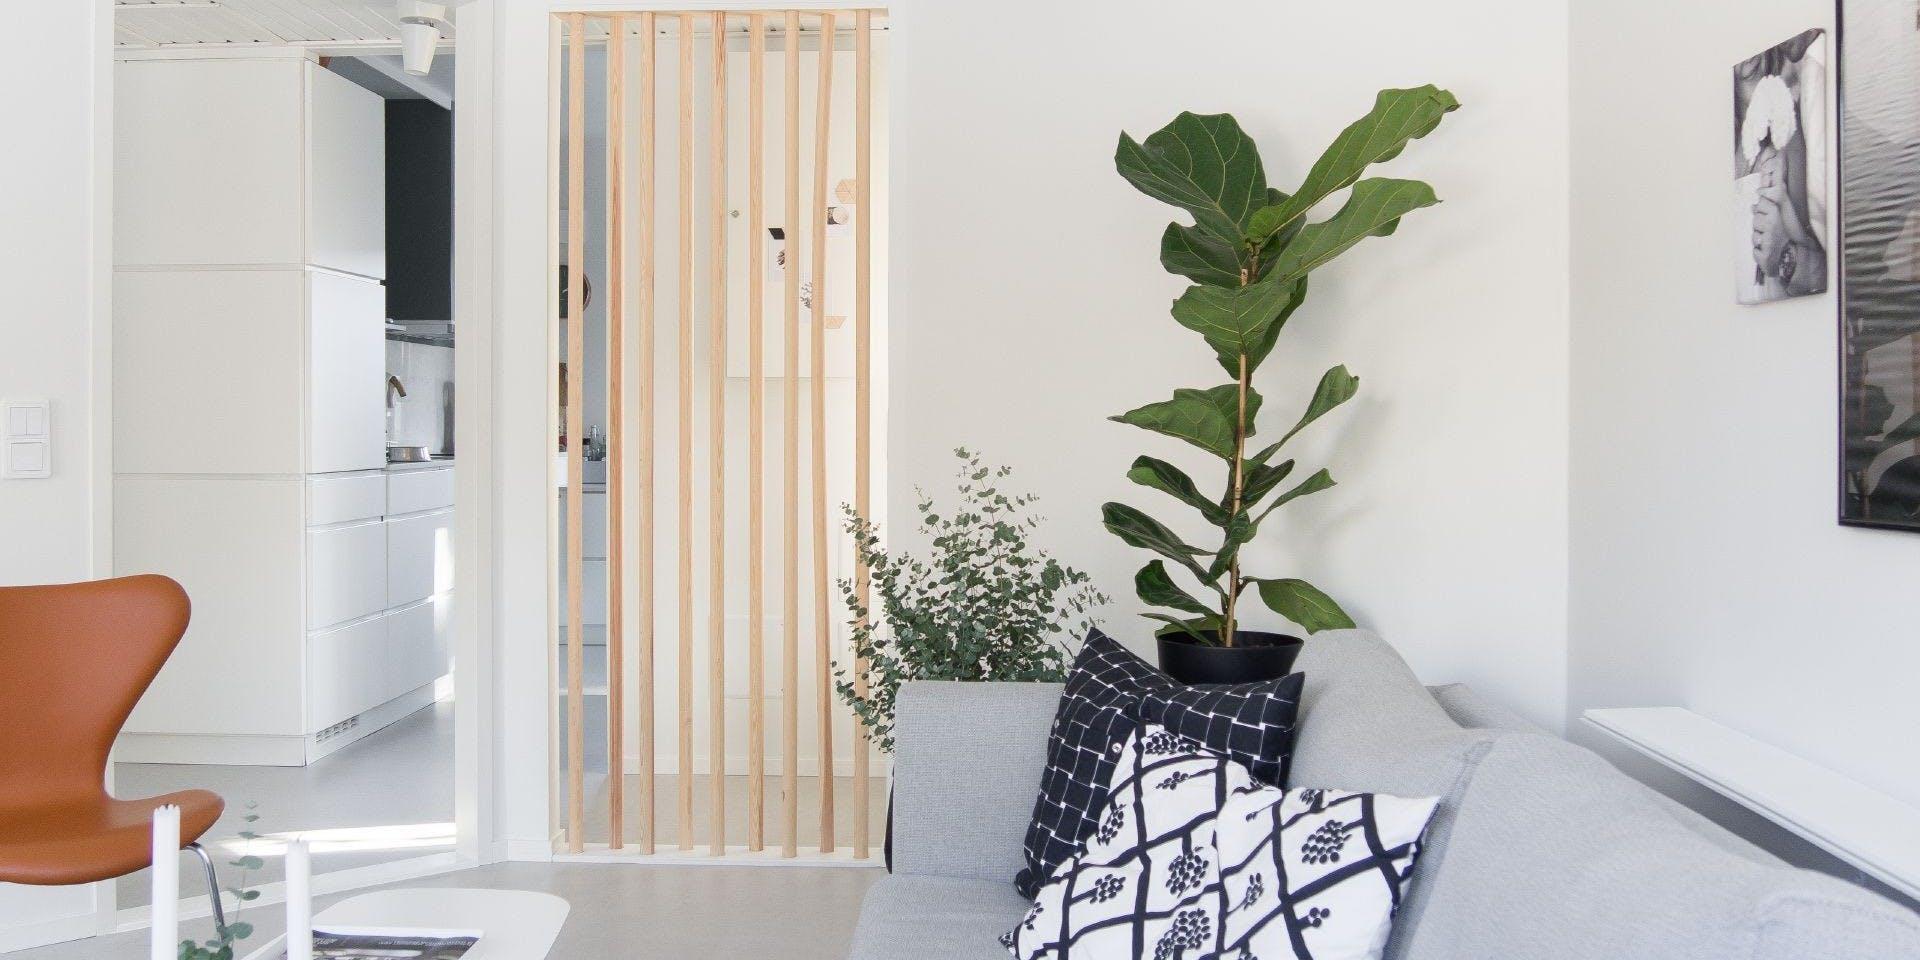 Tikkurila White Paint Living Room Refresh wide Image 1